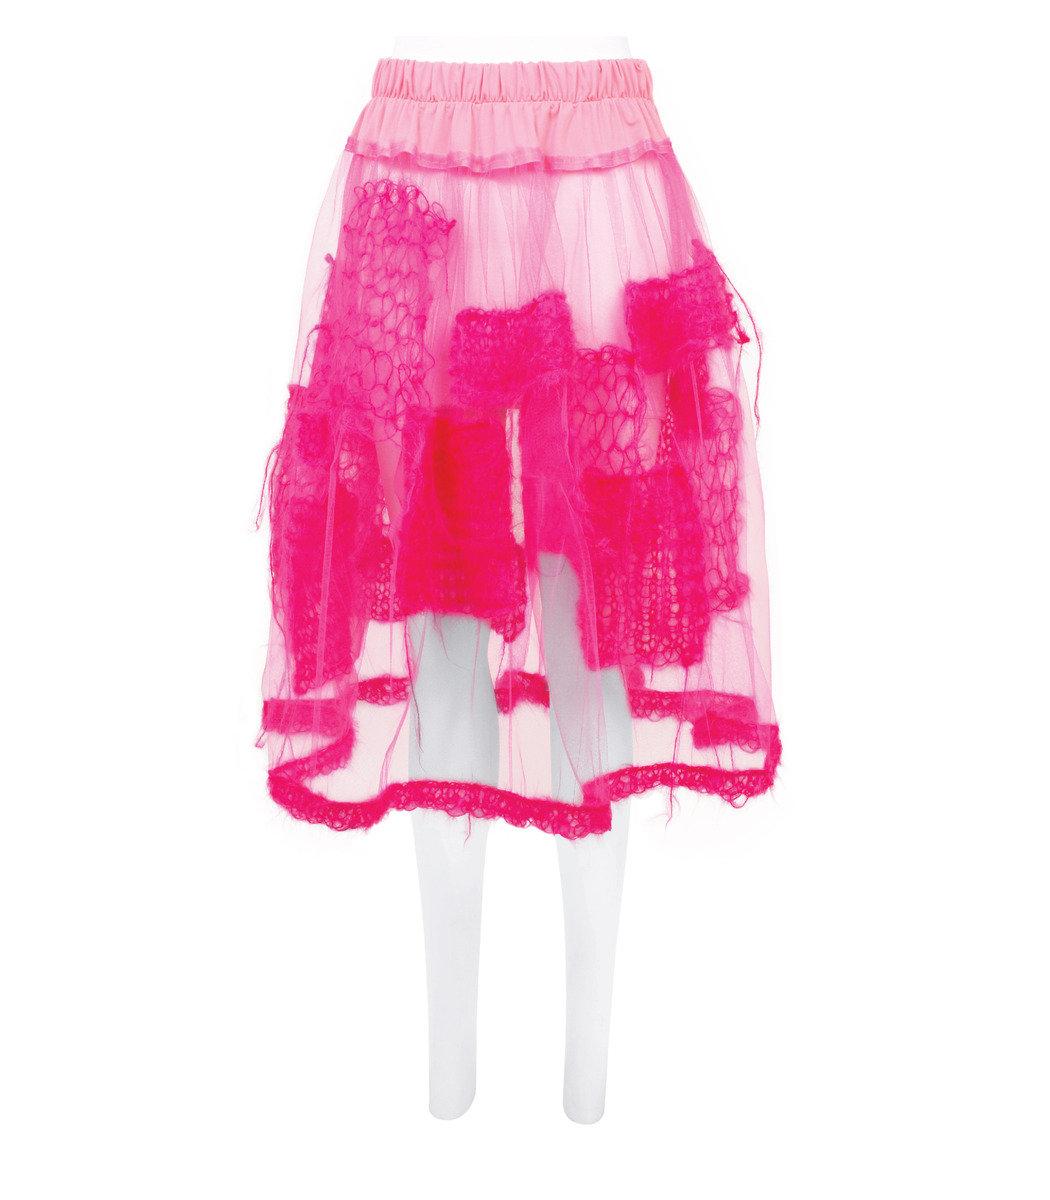 Patch薄紗半身裙